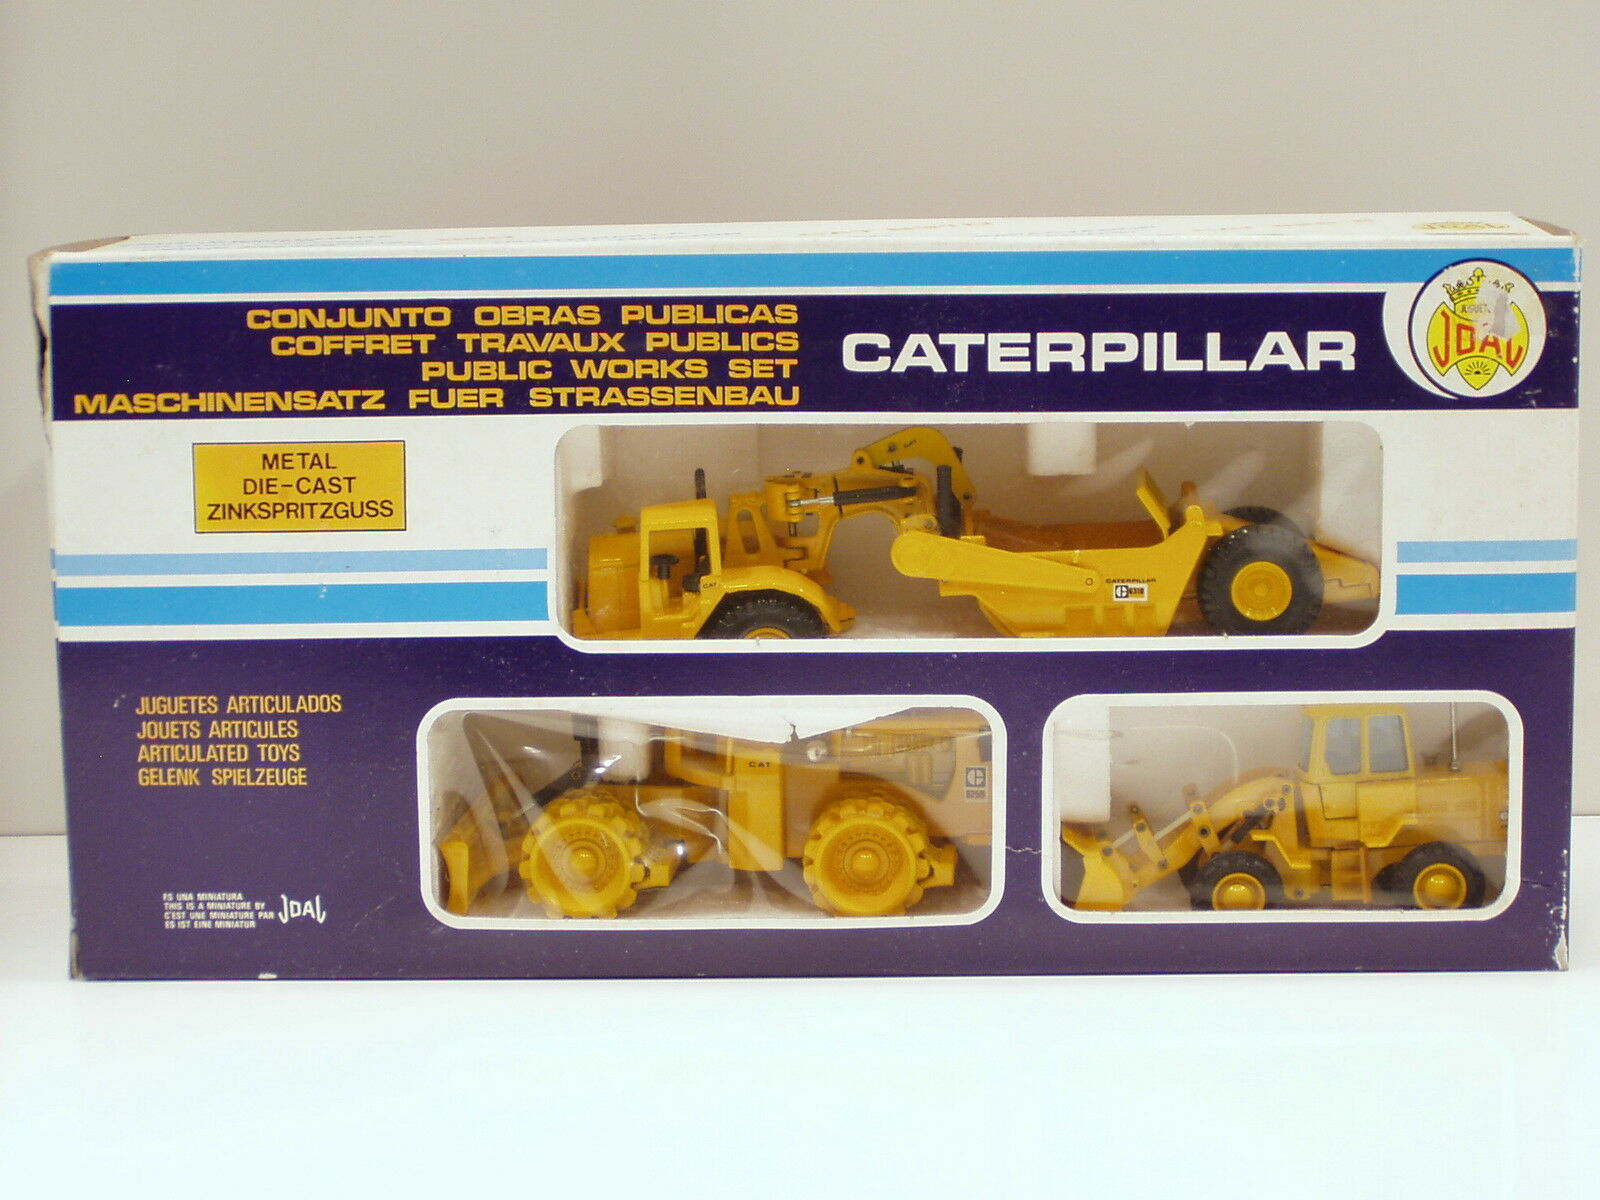 Caterpillar Public Works Set D, 825B, 920 - - - 1 50 & 1 70 Joal MIB 9f4c05